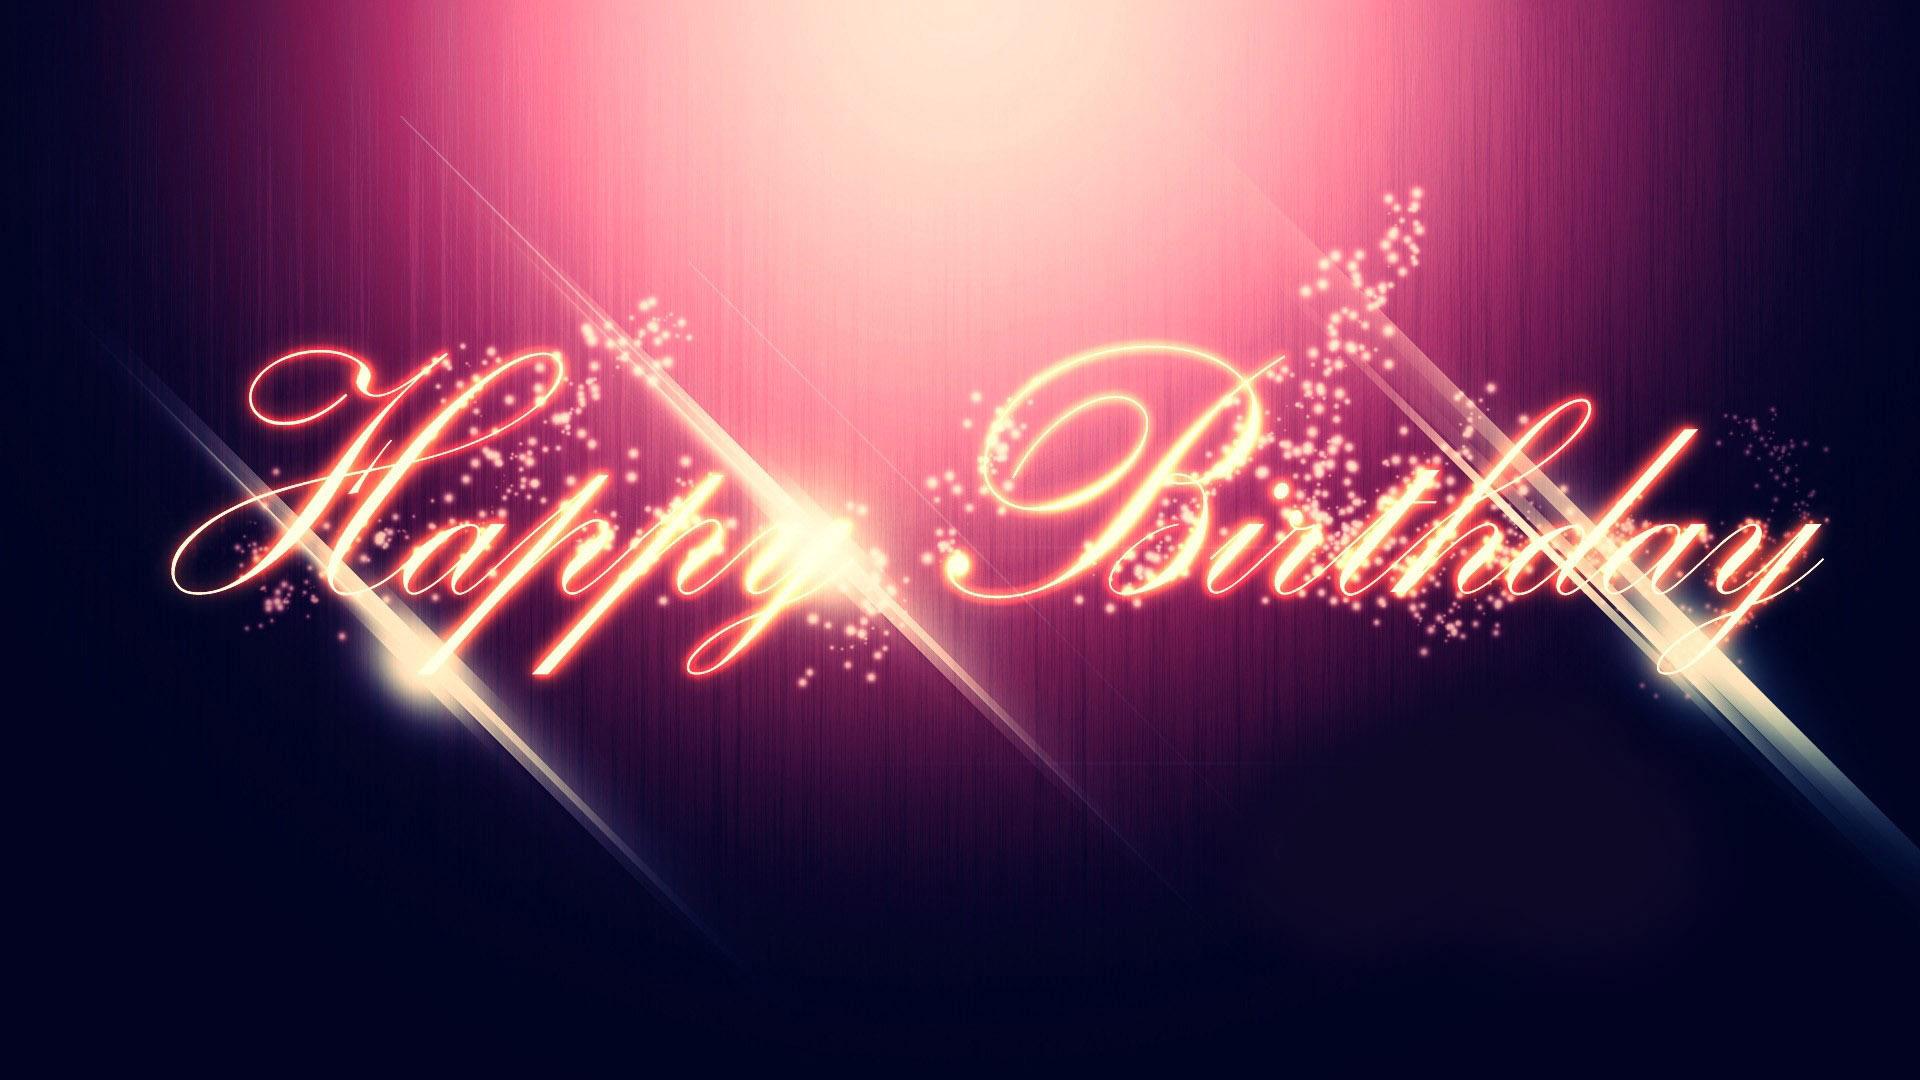 Hd wallpaper birthday -  Happy Birthday Wallpaper